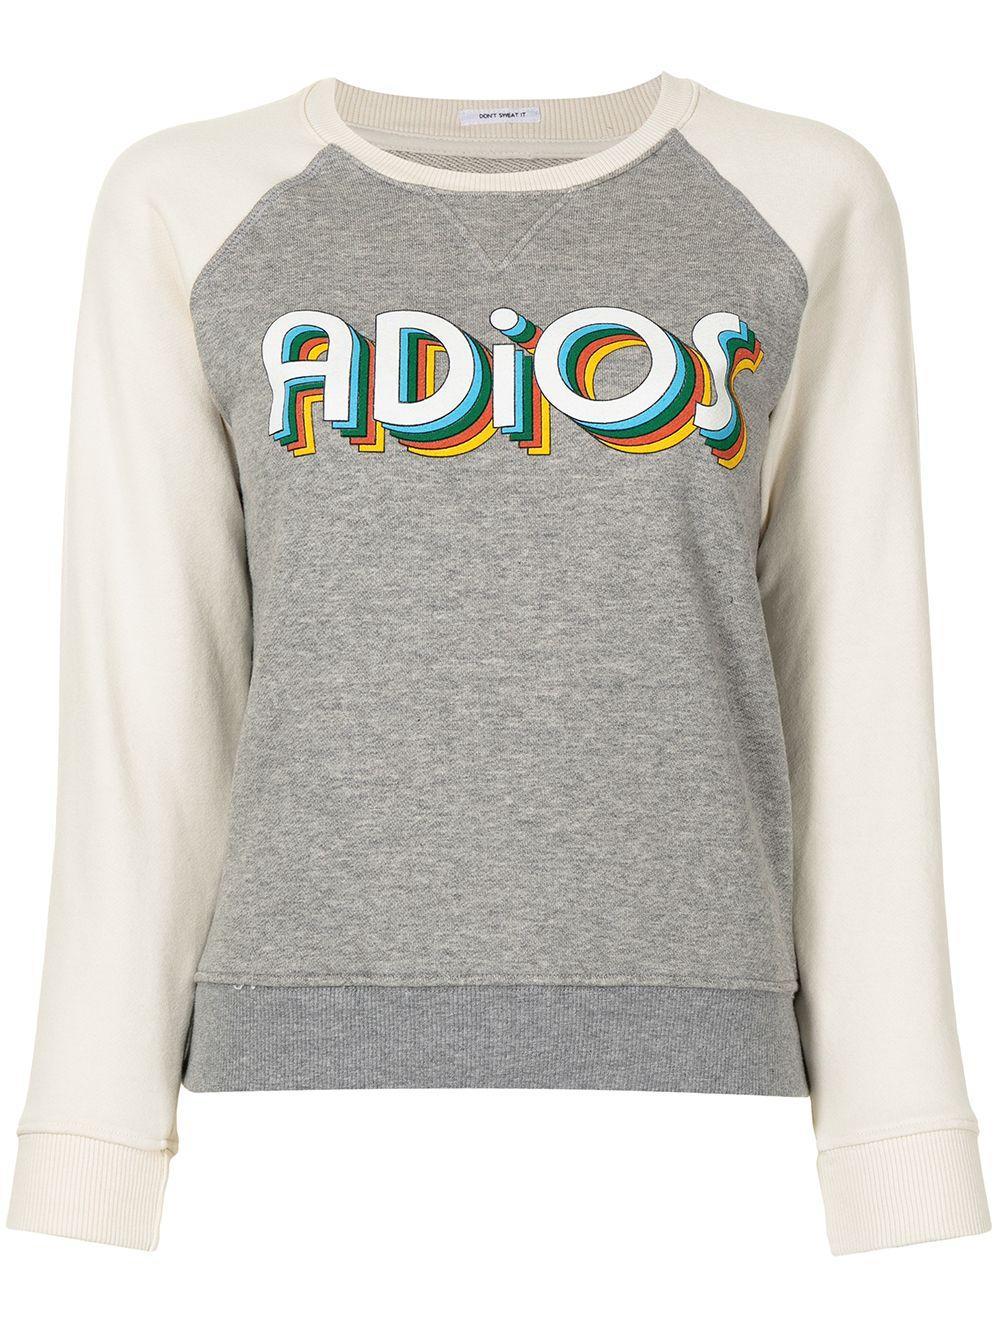 The Square Adios Sweatshirt